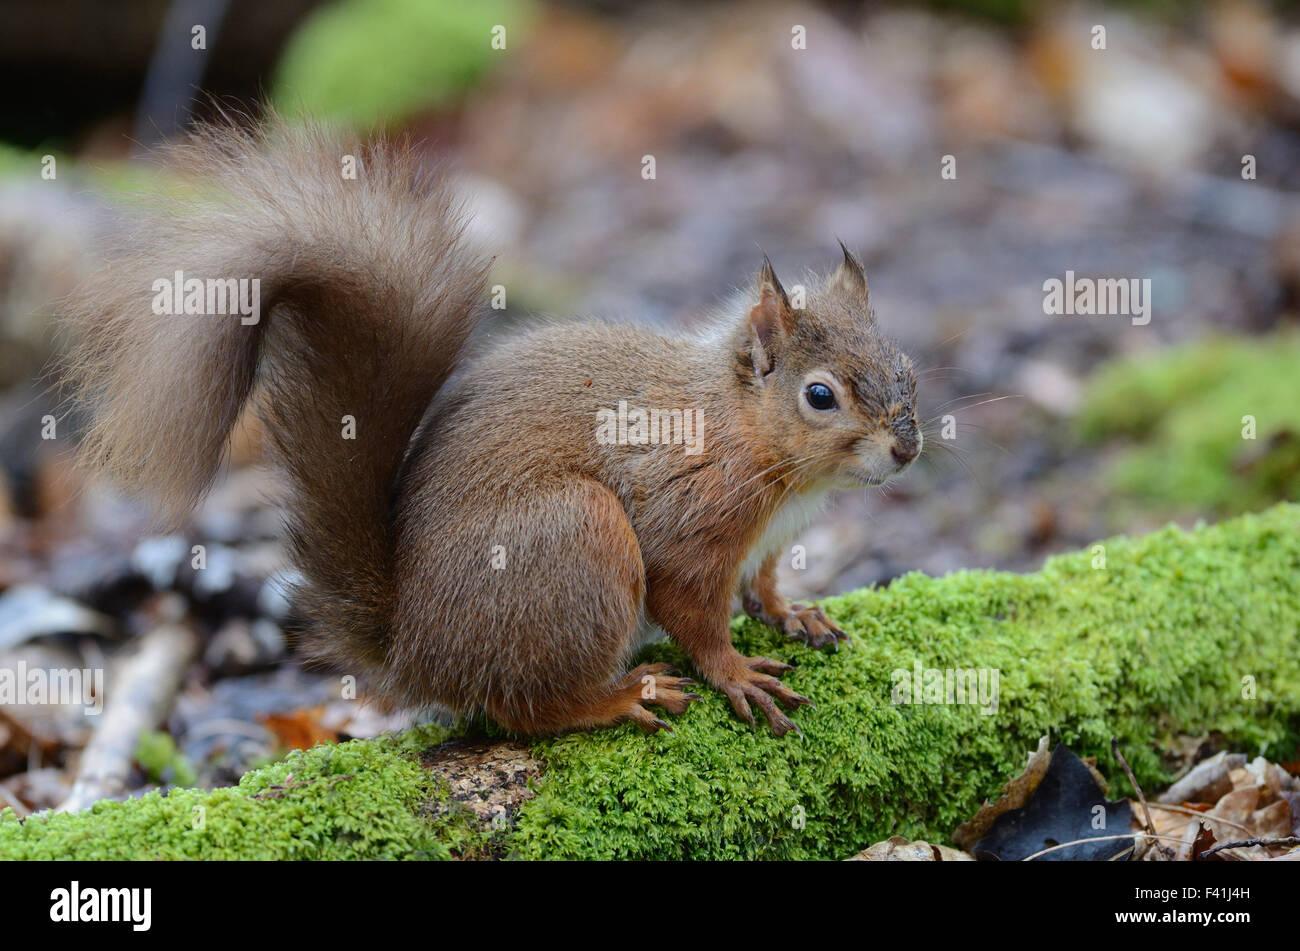 Adult red squirrel, alert posture. Brownsea Island, Dorset, UK February 2014 - Stock Image